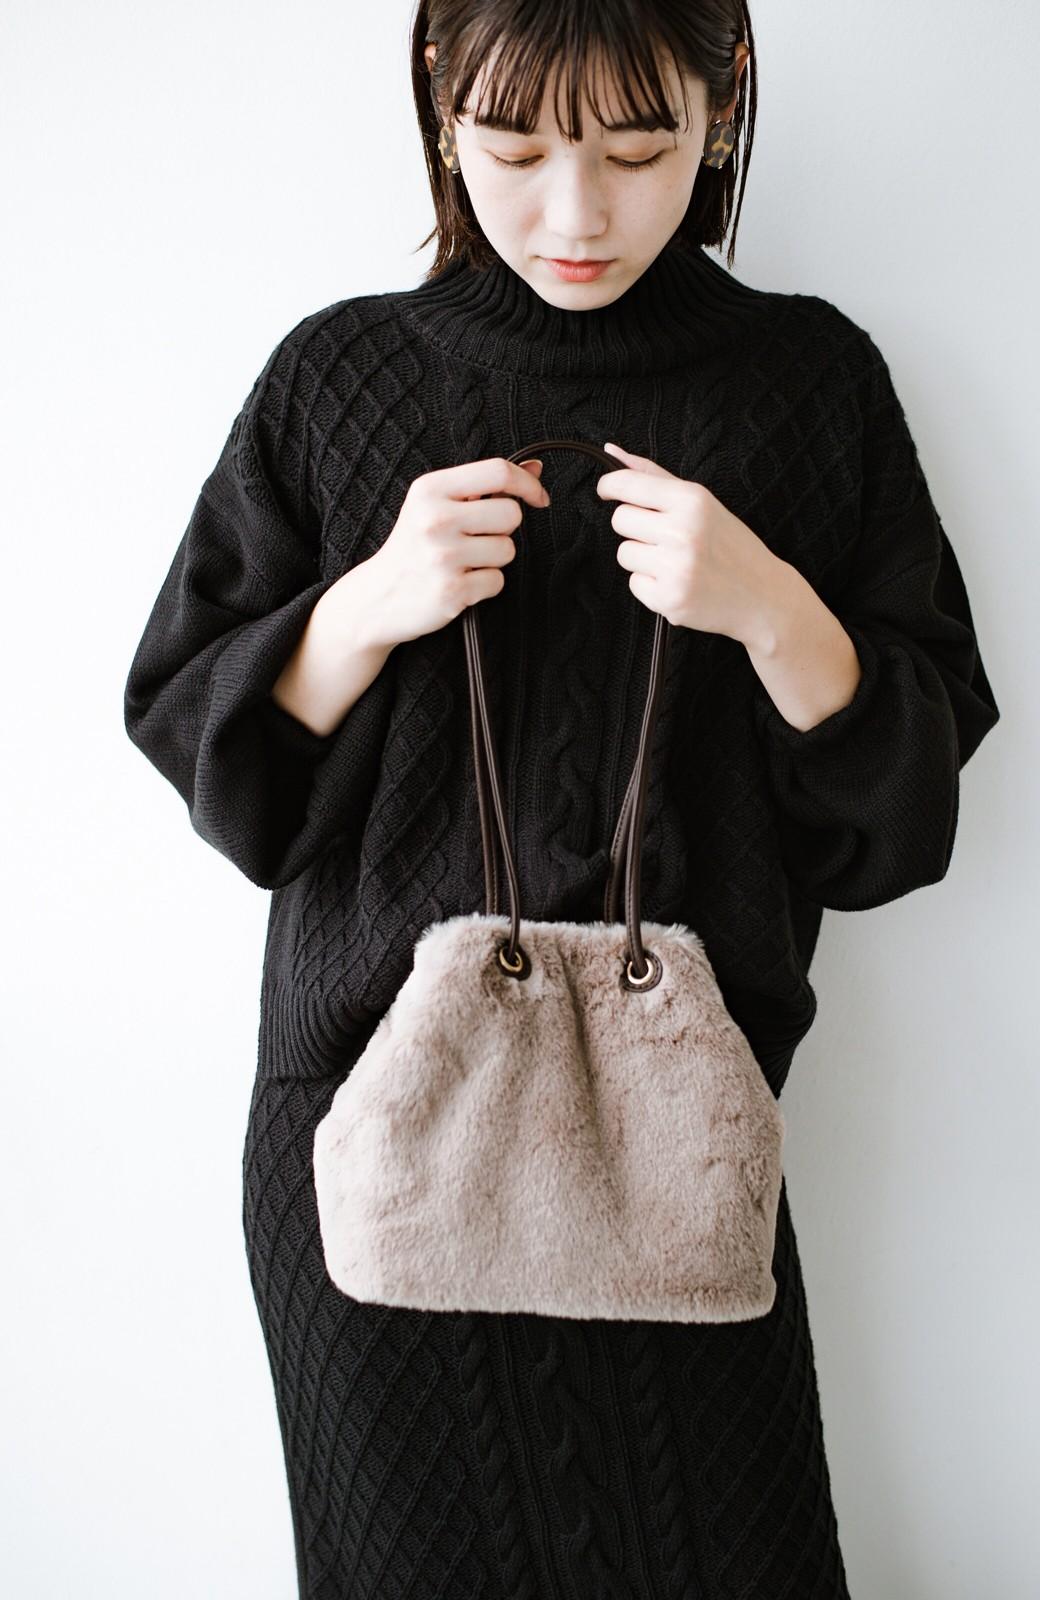 haco! さっと持って気分が上がる ふわっとかわいいエコファー巾着バッグ <グレイッシュベージュ>の商品写真1